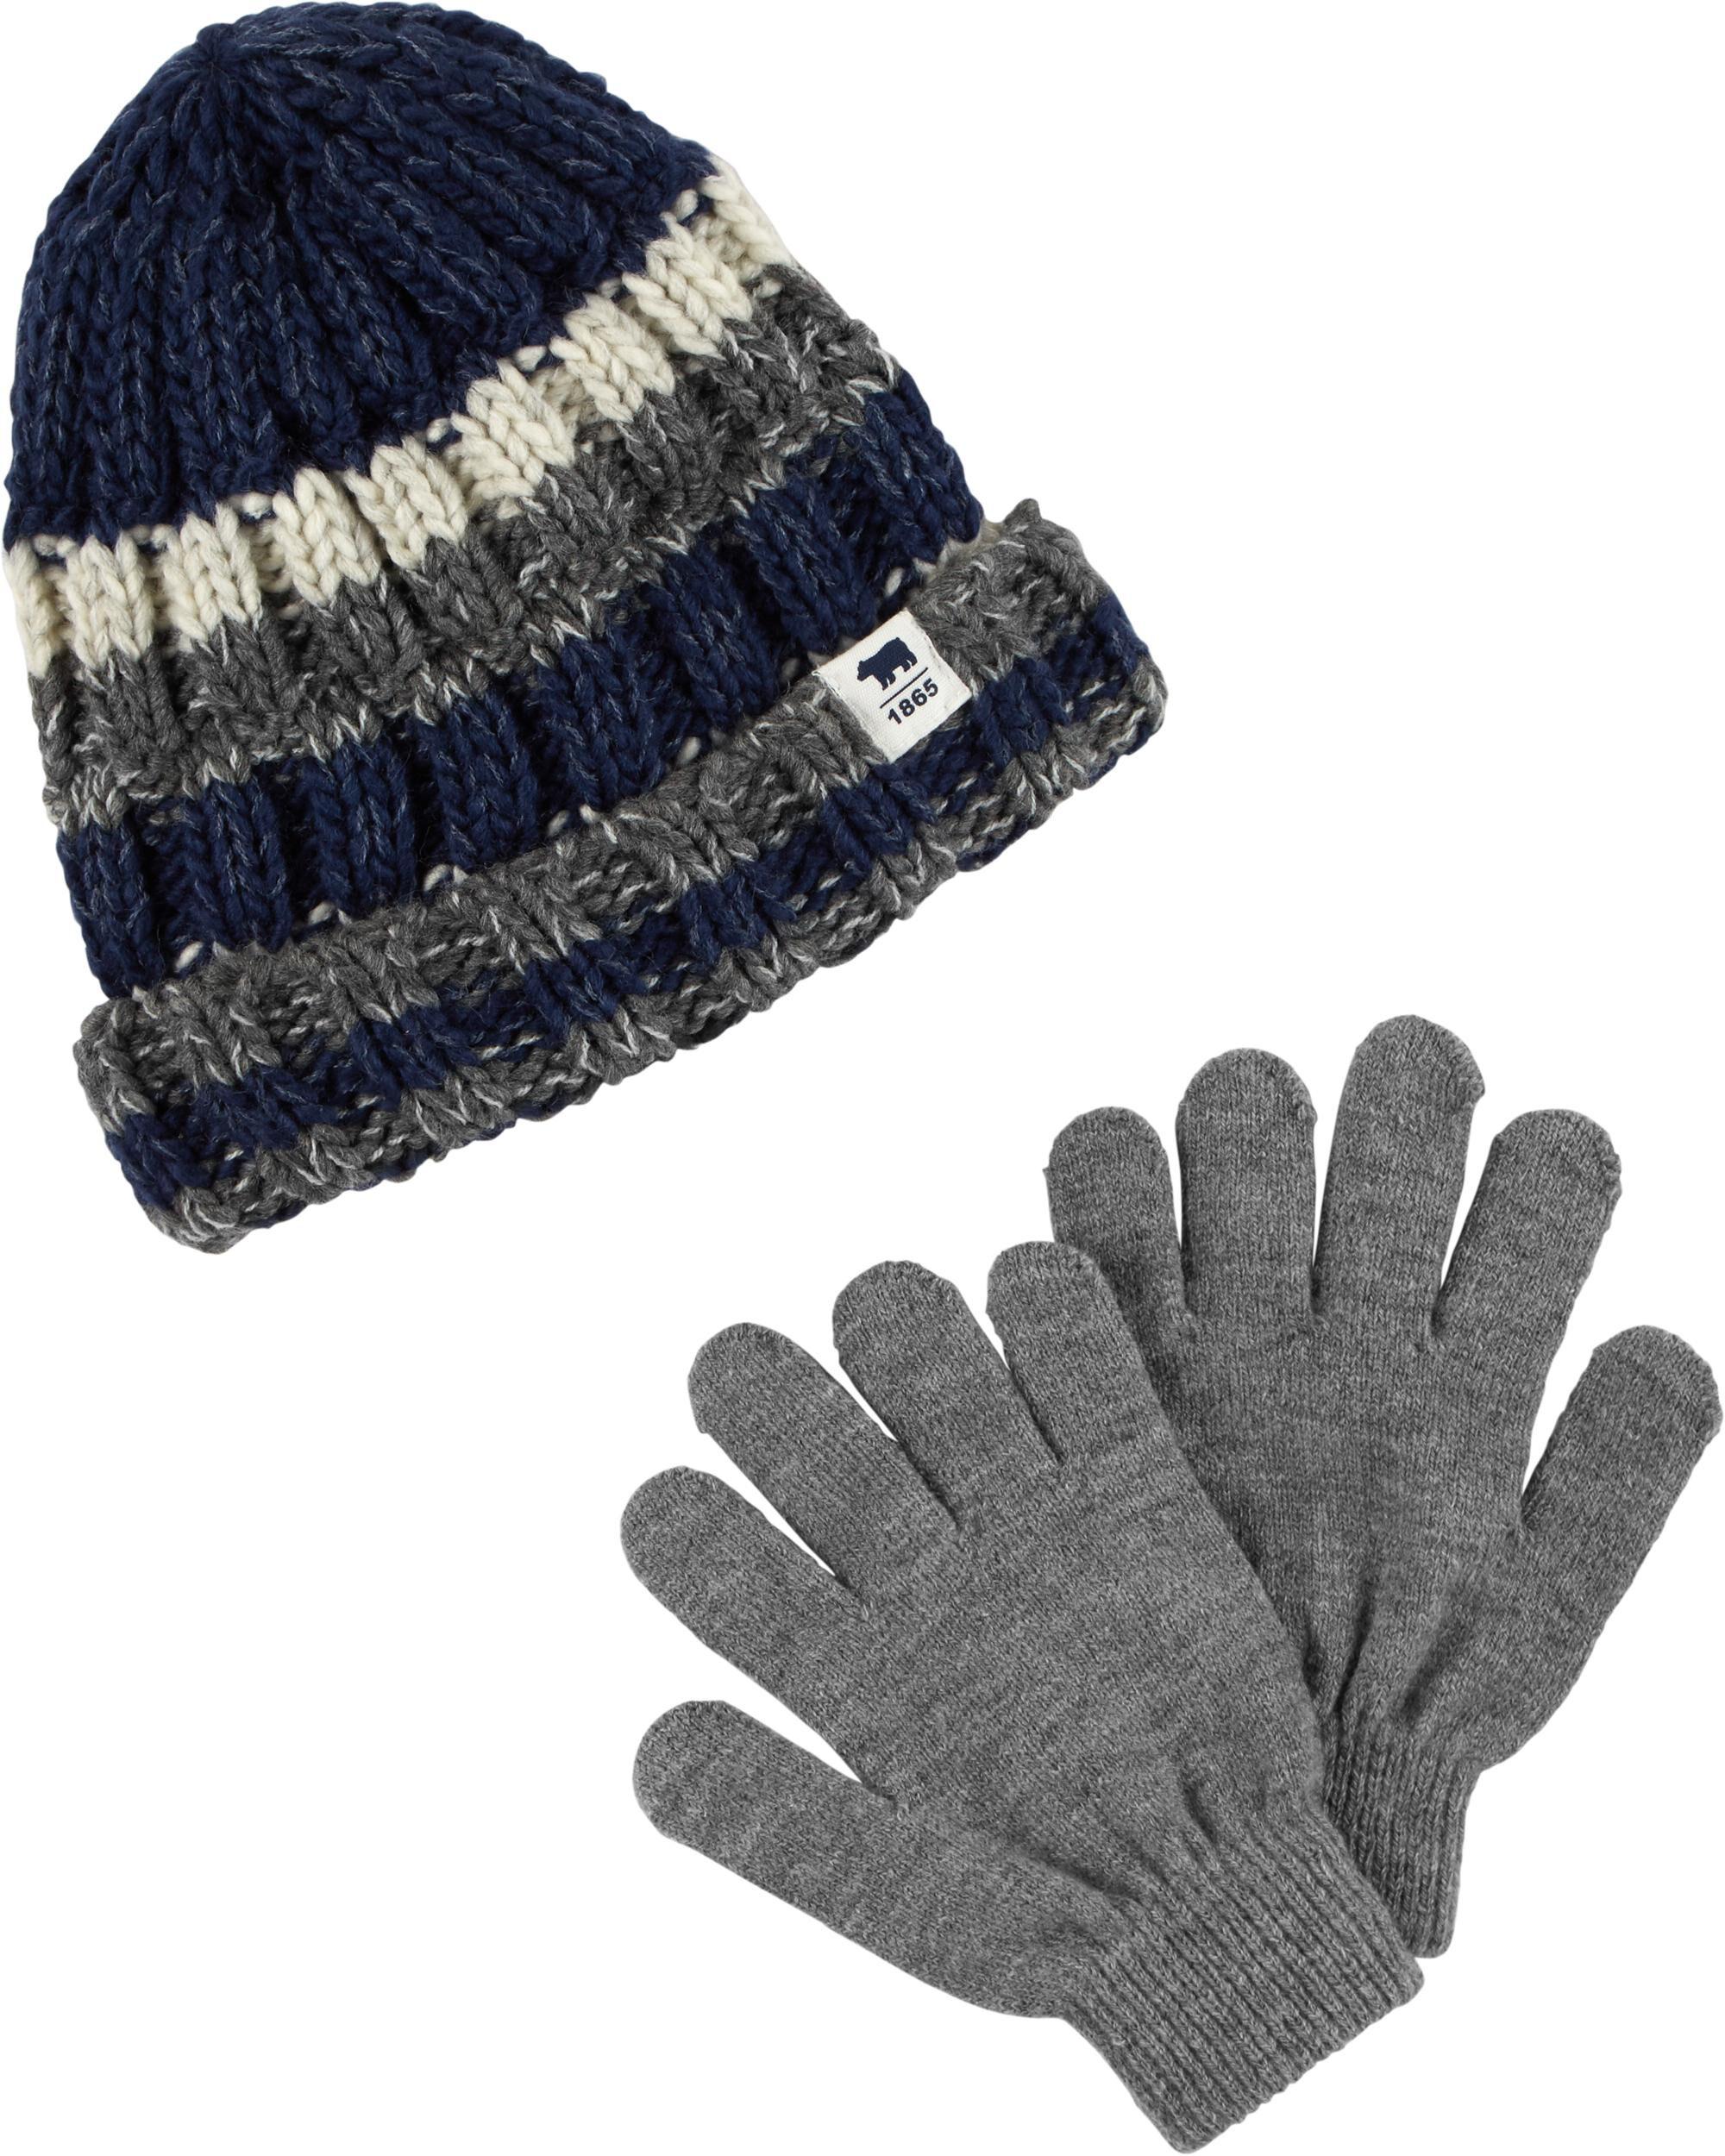 Striped Hat   Mitten Set. Loading zoom 00280b1510e3